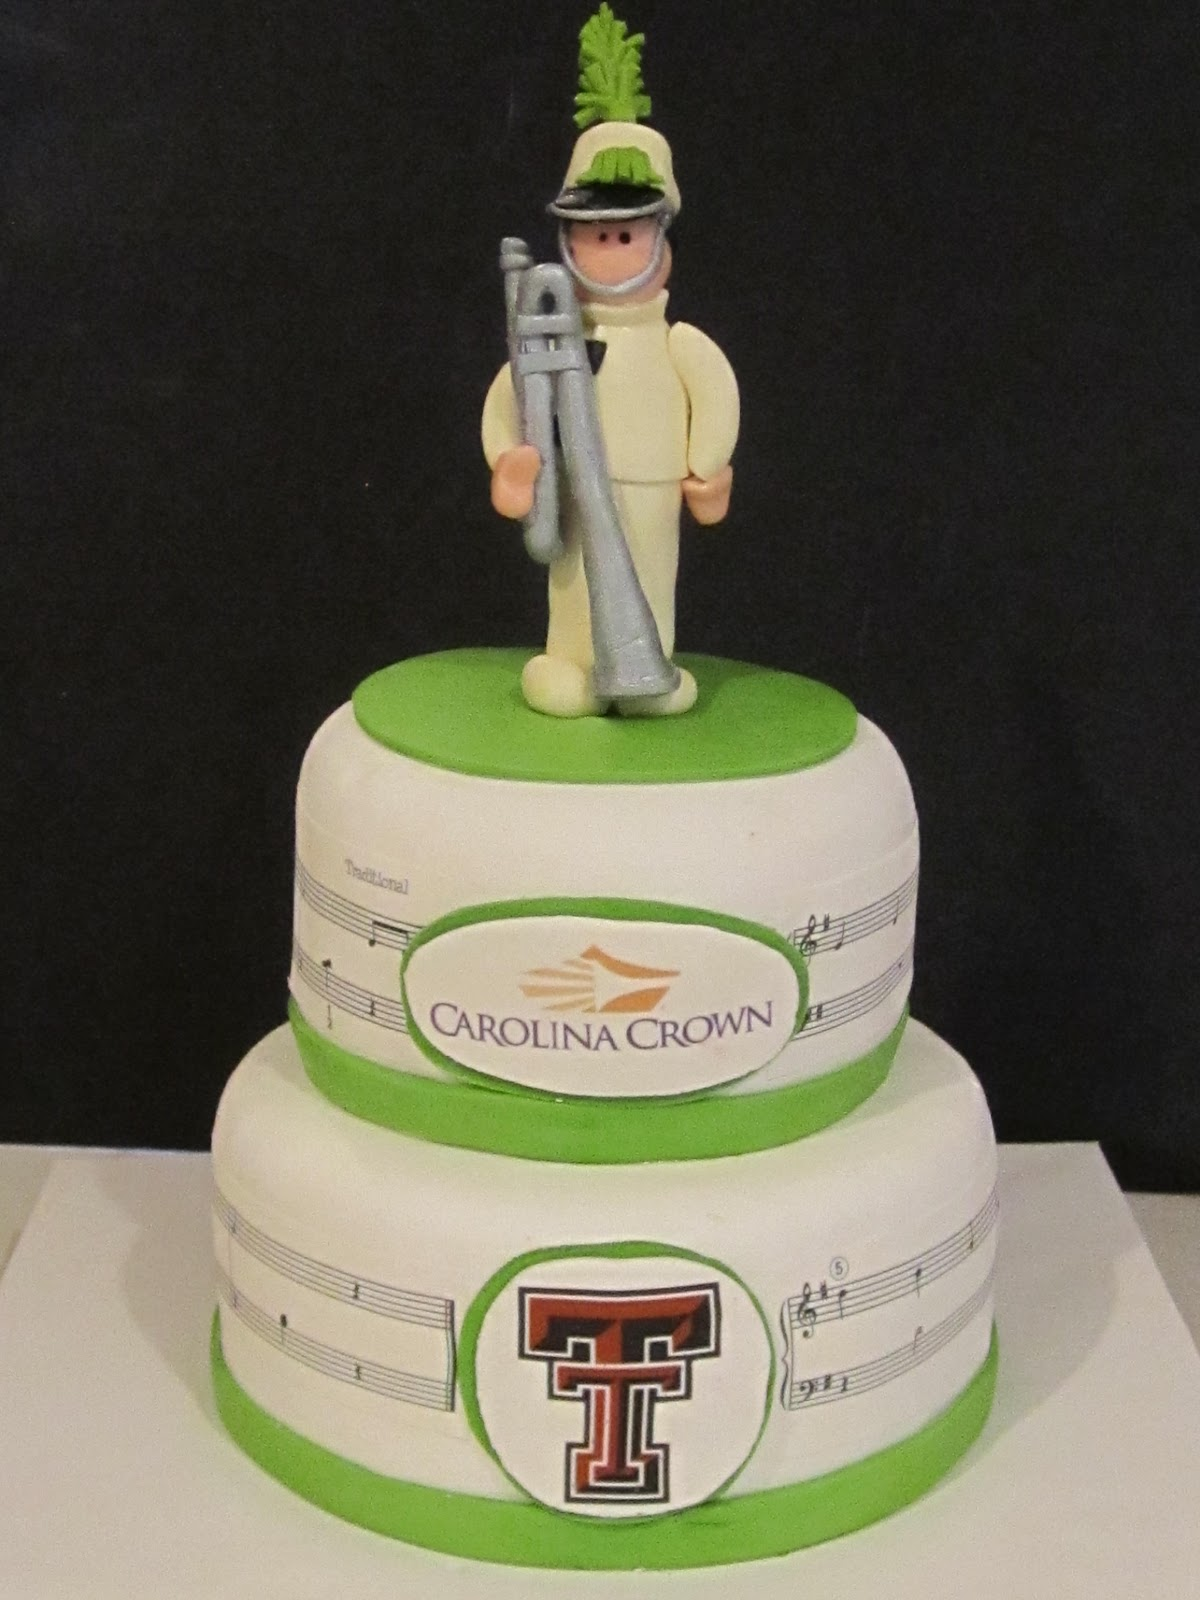 Frosted Insanity Carolina Crown Birthday Cake